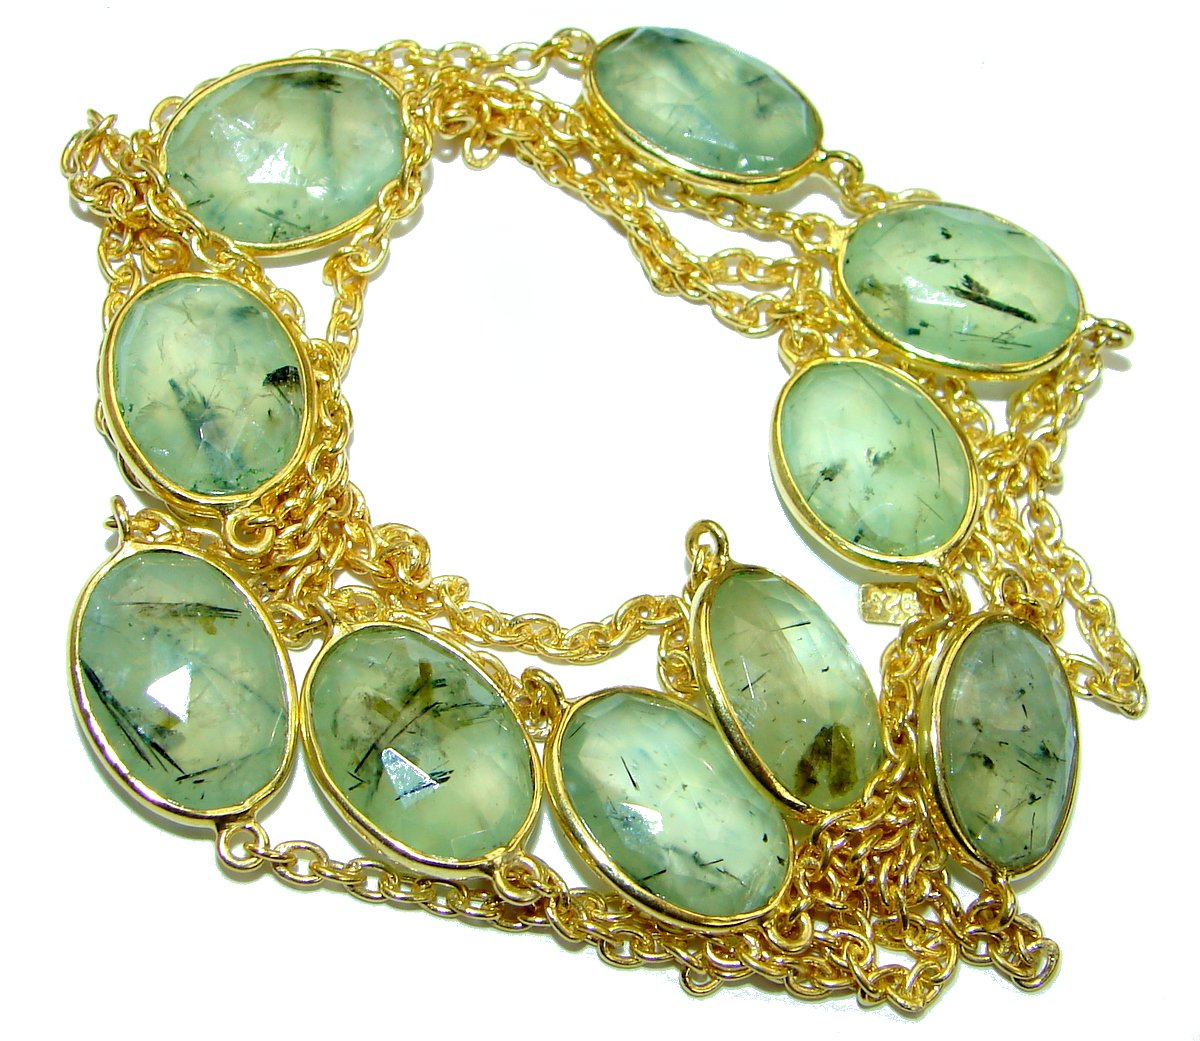 SilverRush Style Moss Prehnite Women 925 Sterling Silver Necklace - FREE GIFT BOX